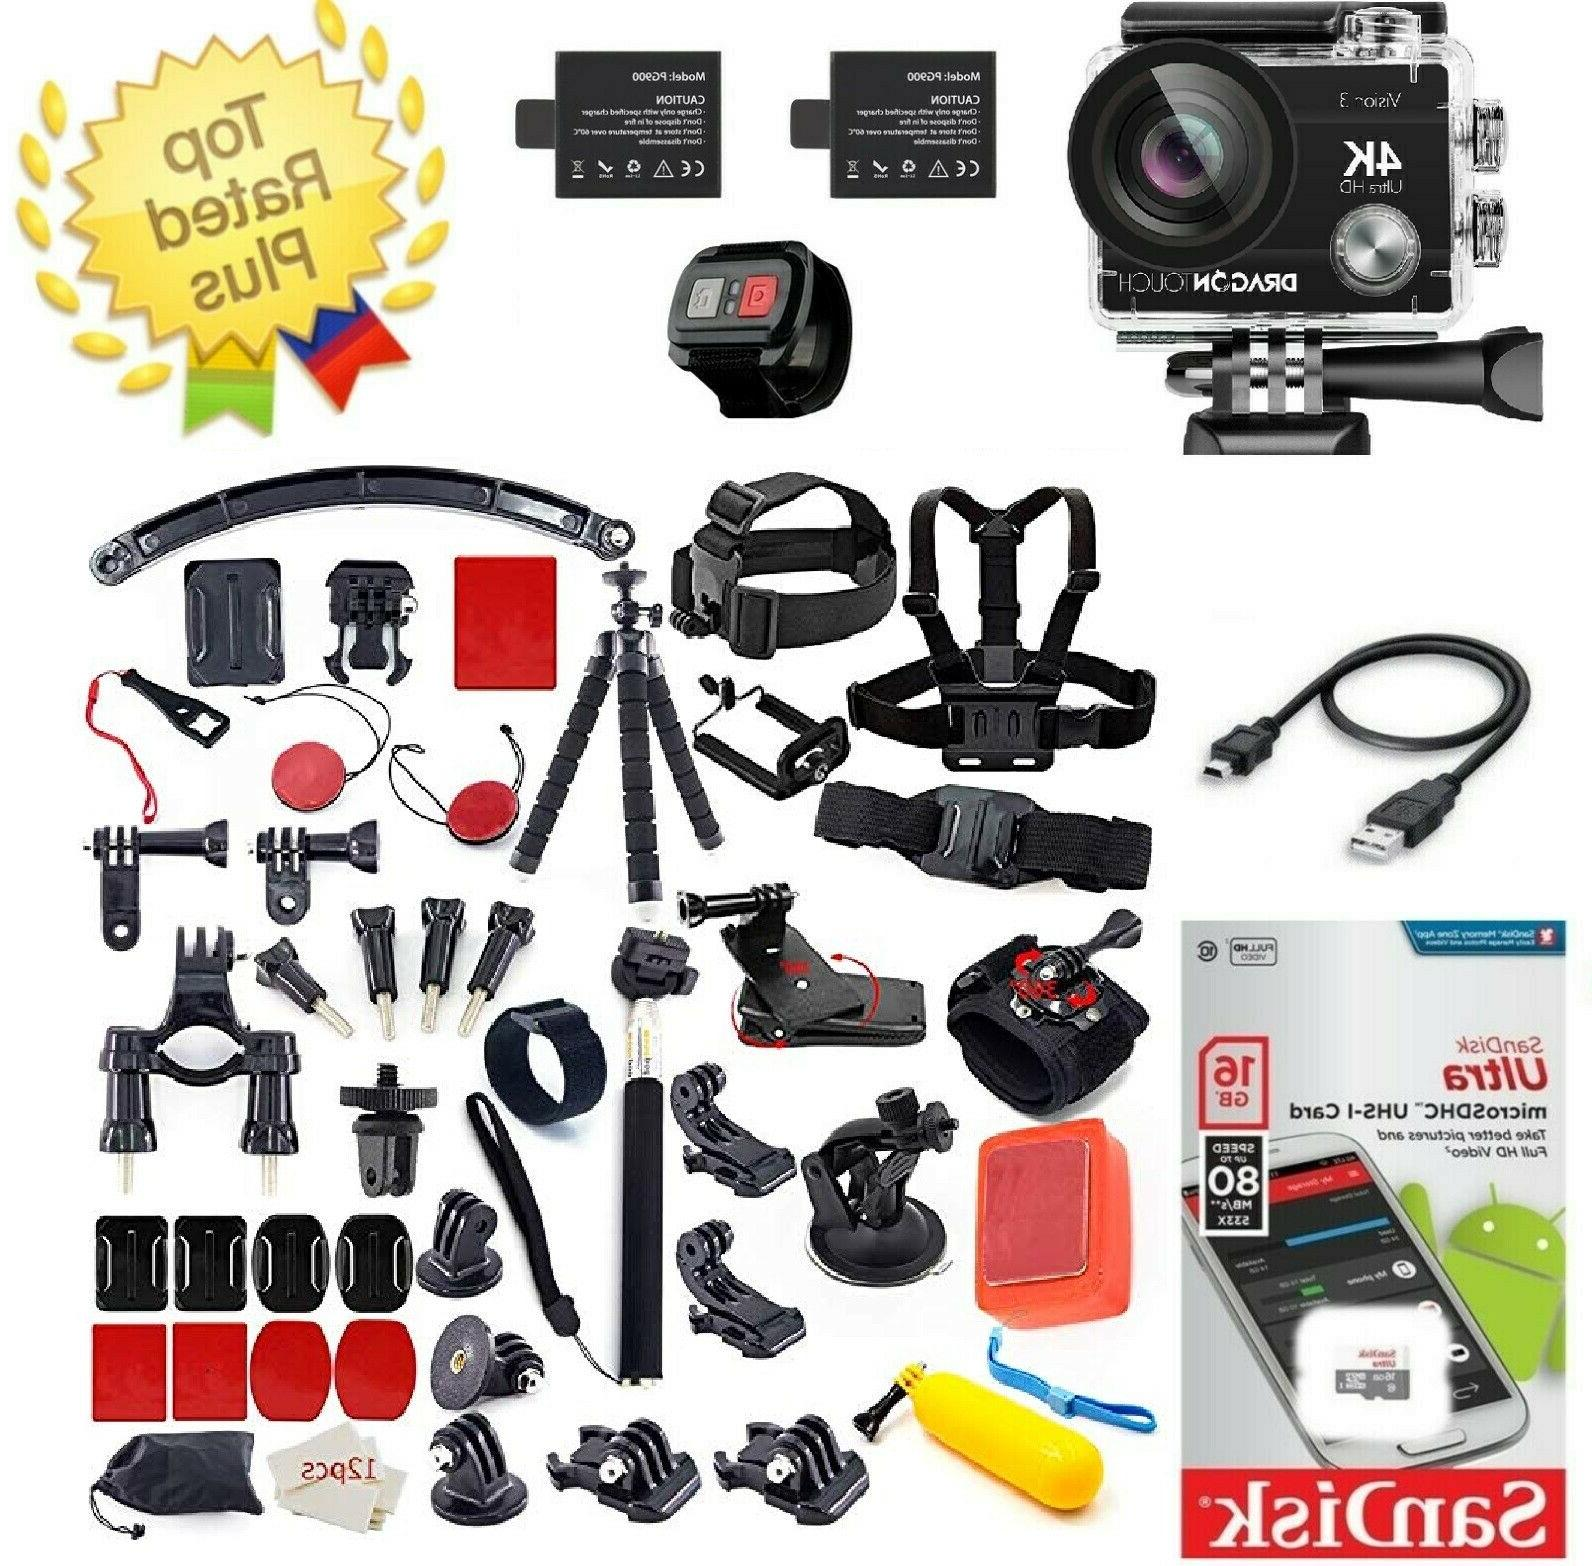 4k waterproof action camera 16mp accessory kit